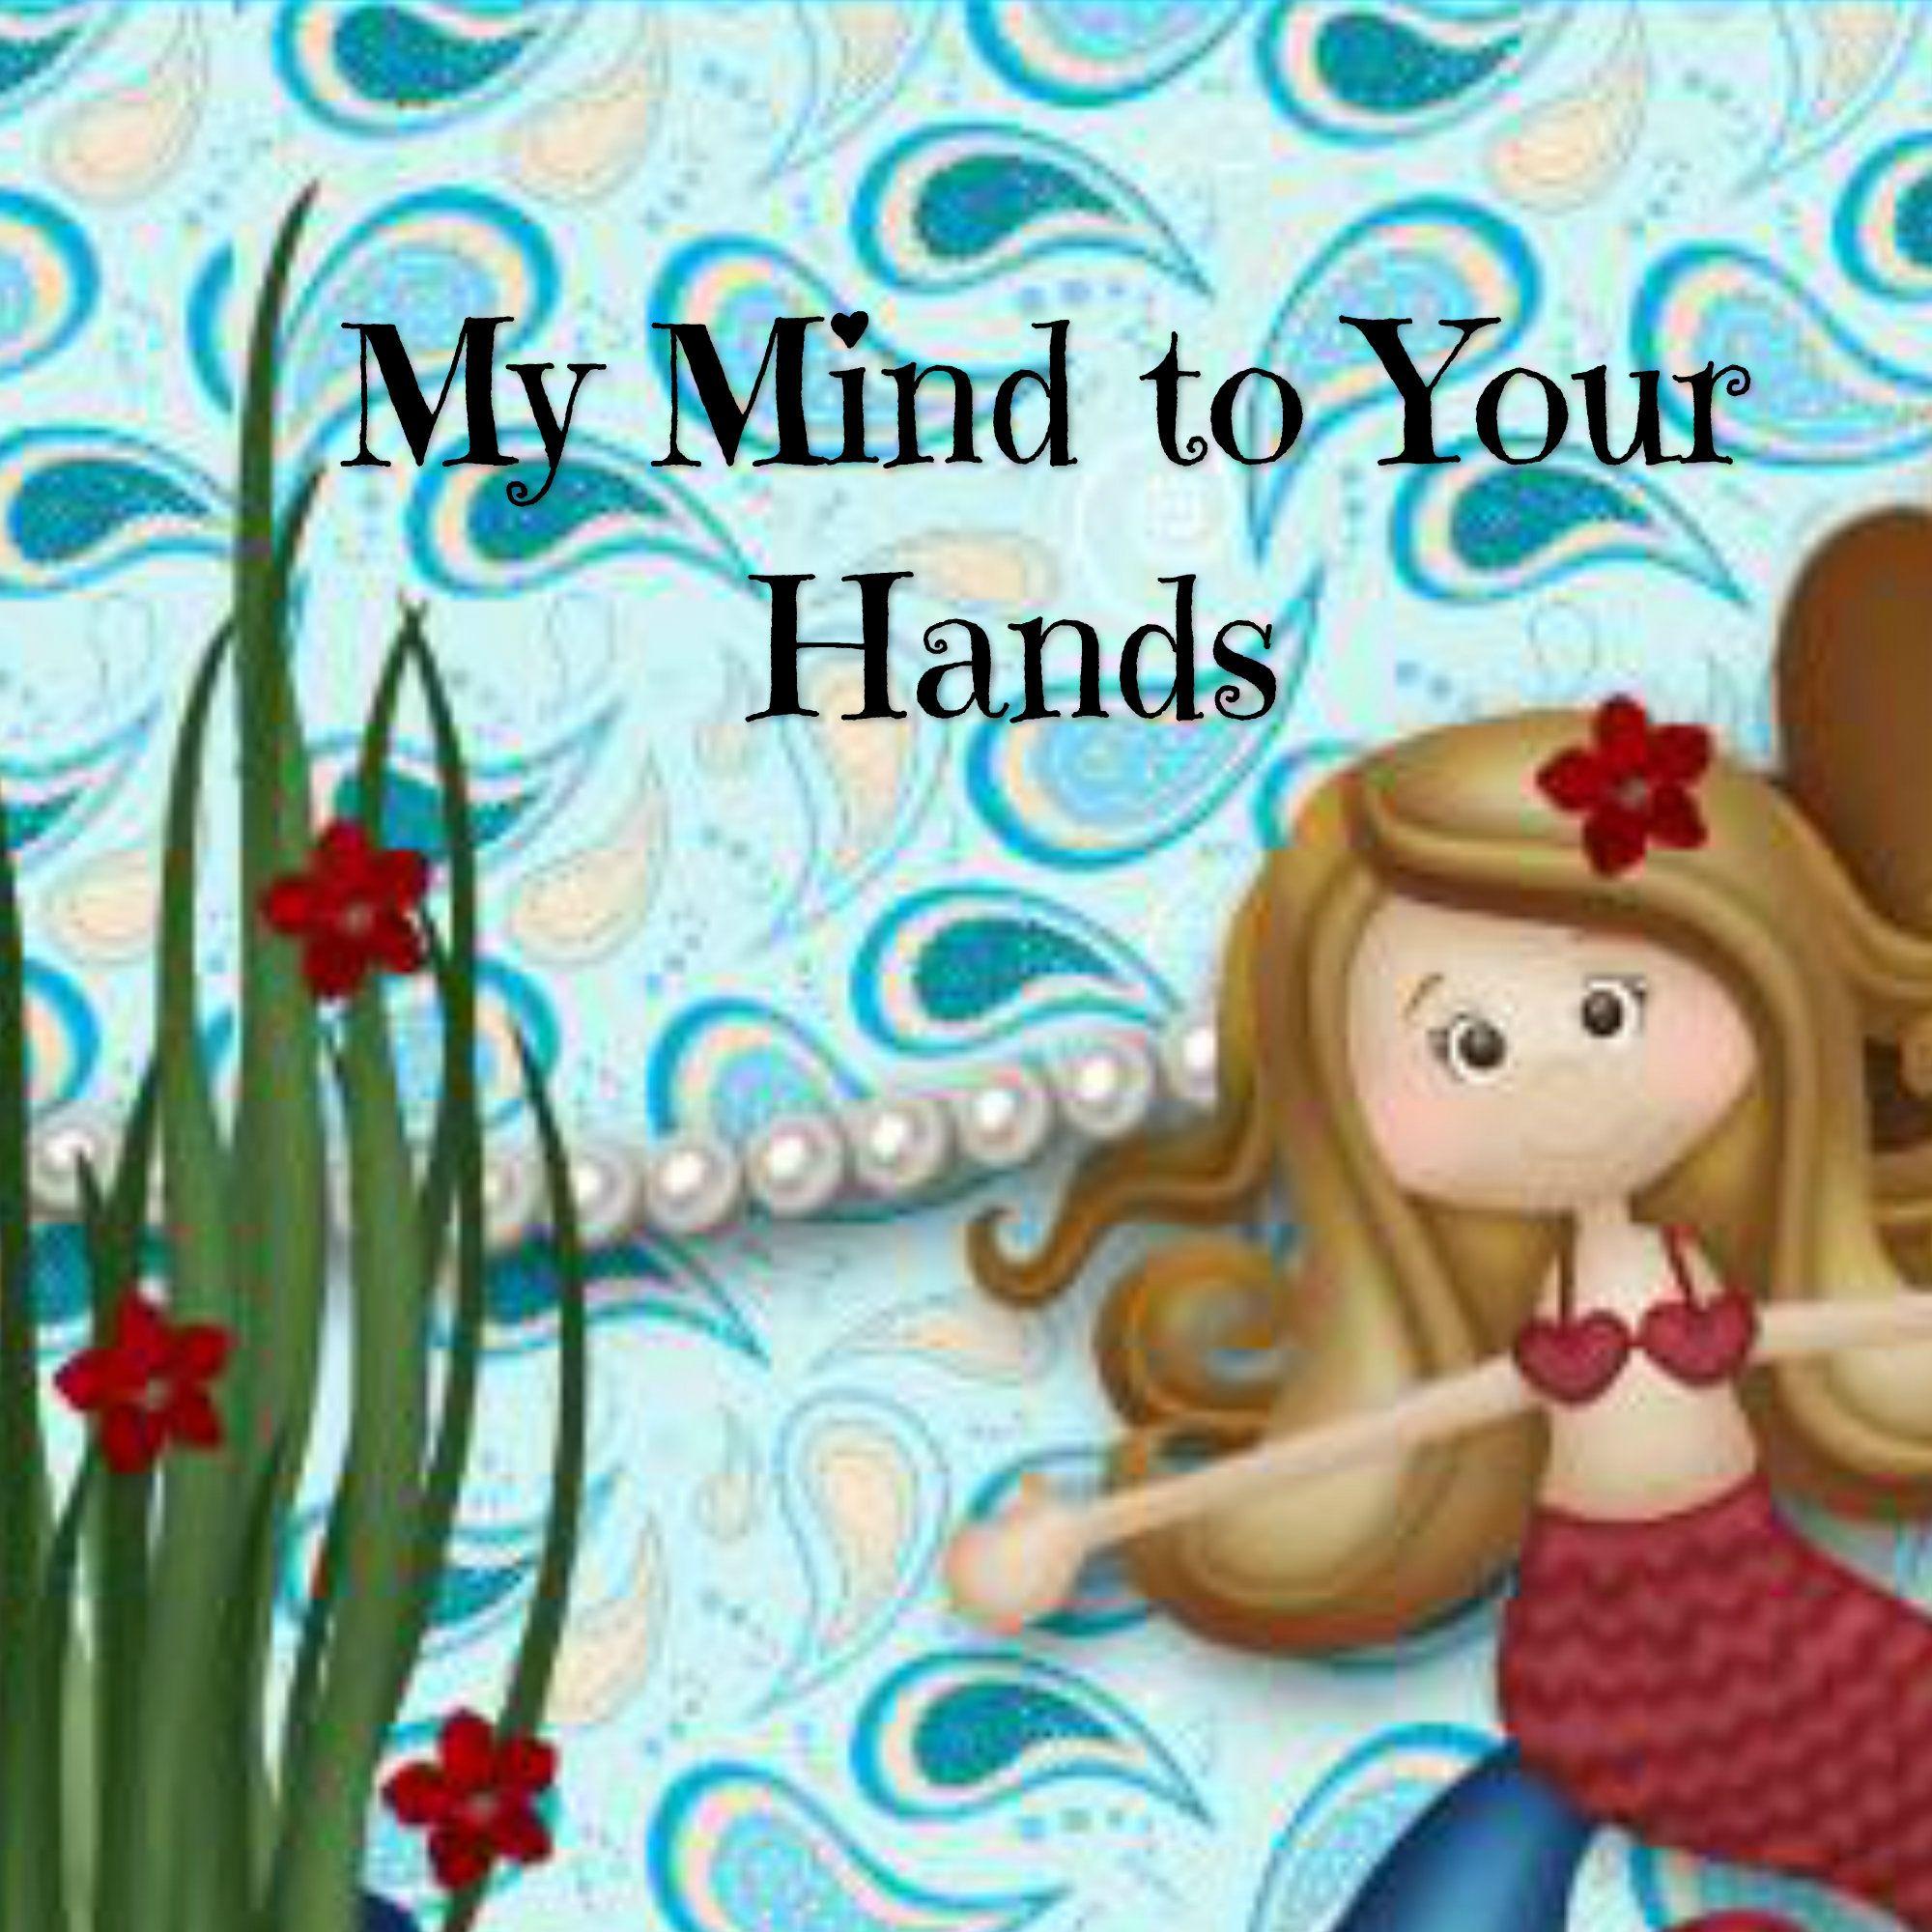 My Mind to Your Hands https://www.facebook.com/MyMindToYourHands